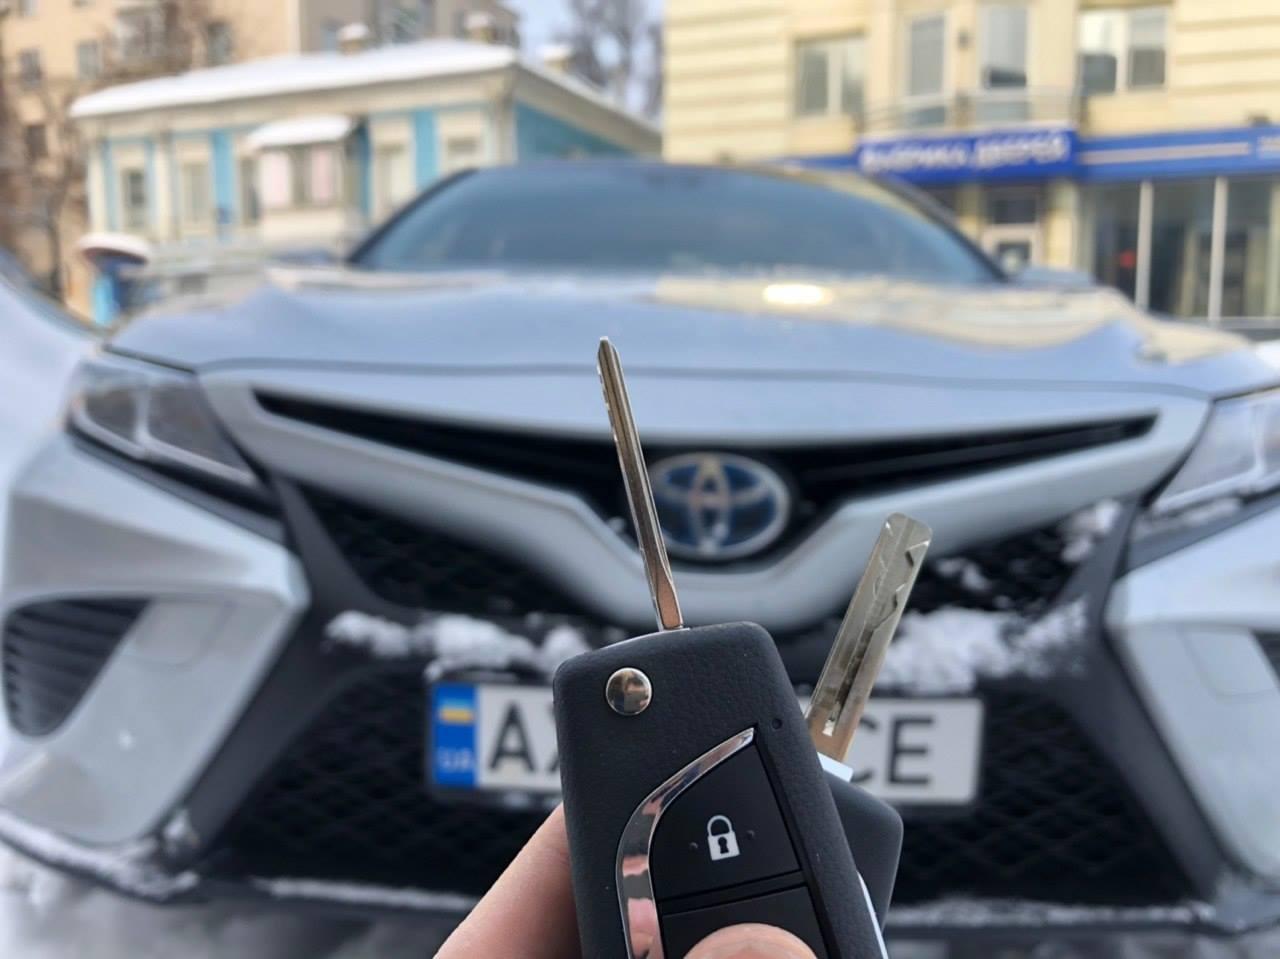 Ключ на Toyota Camry 2018